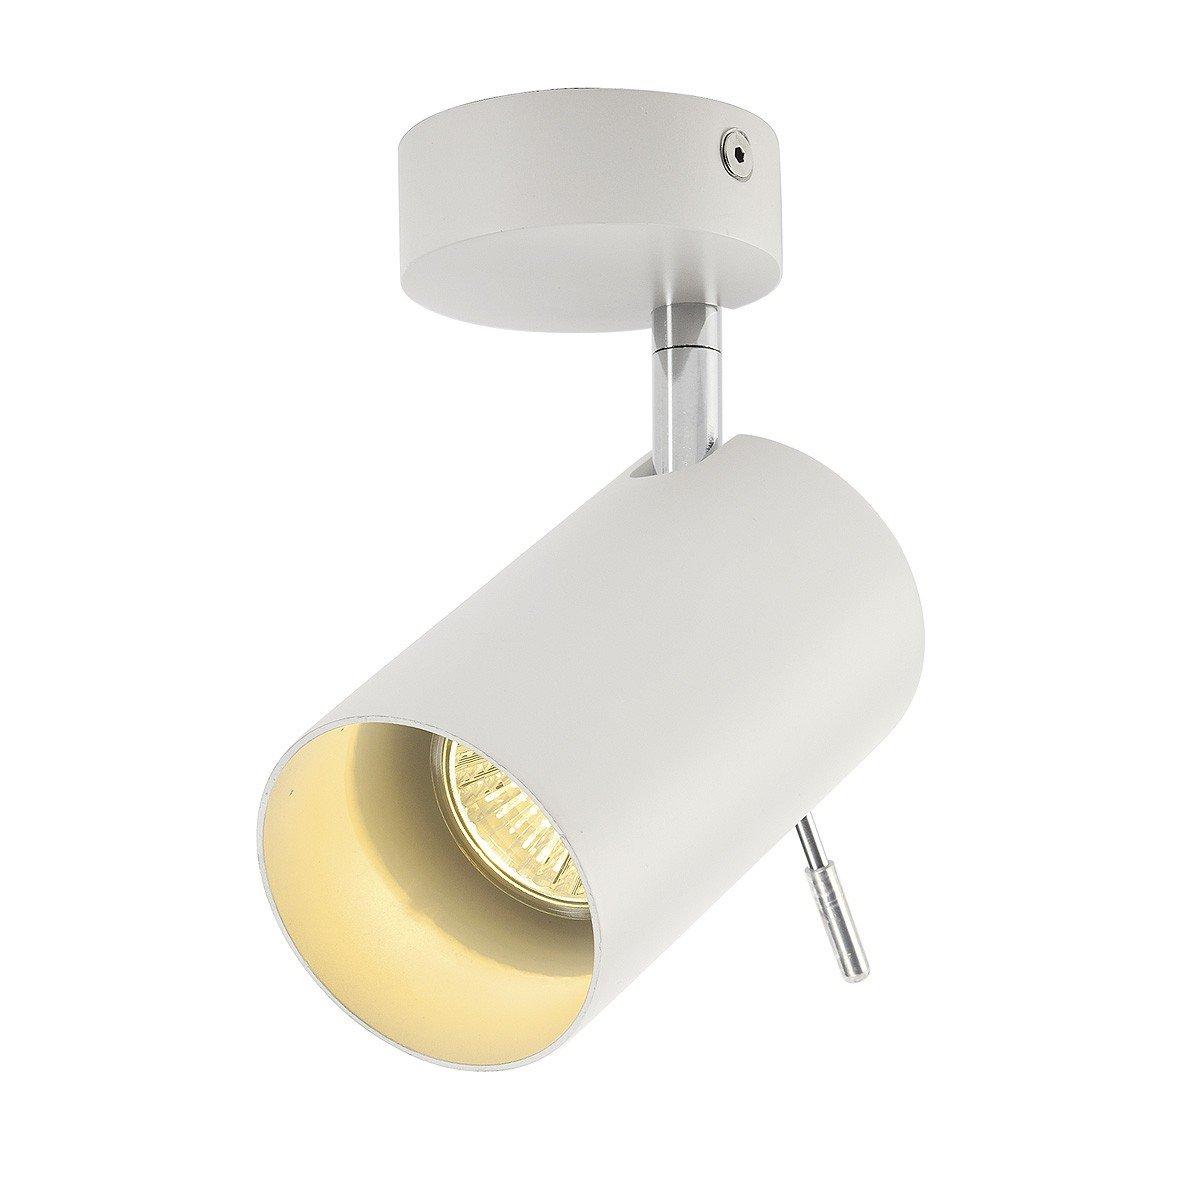 Slv asto tube i wall and ceiling light amazon lighting aloadofball Choice Image